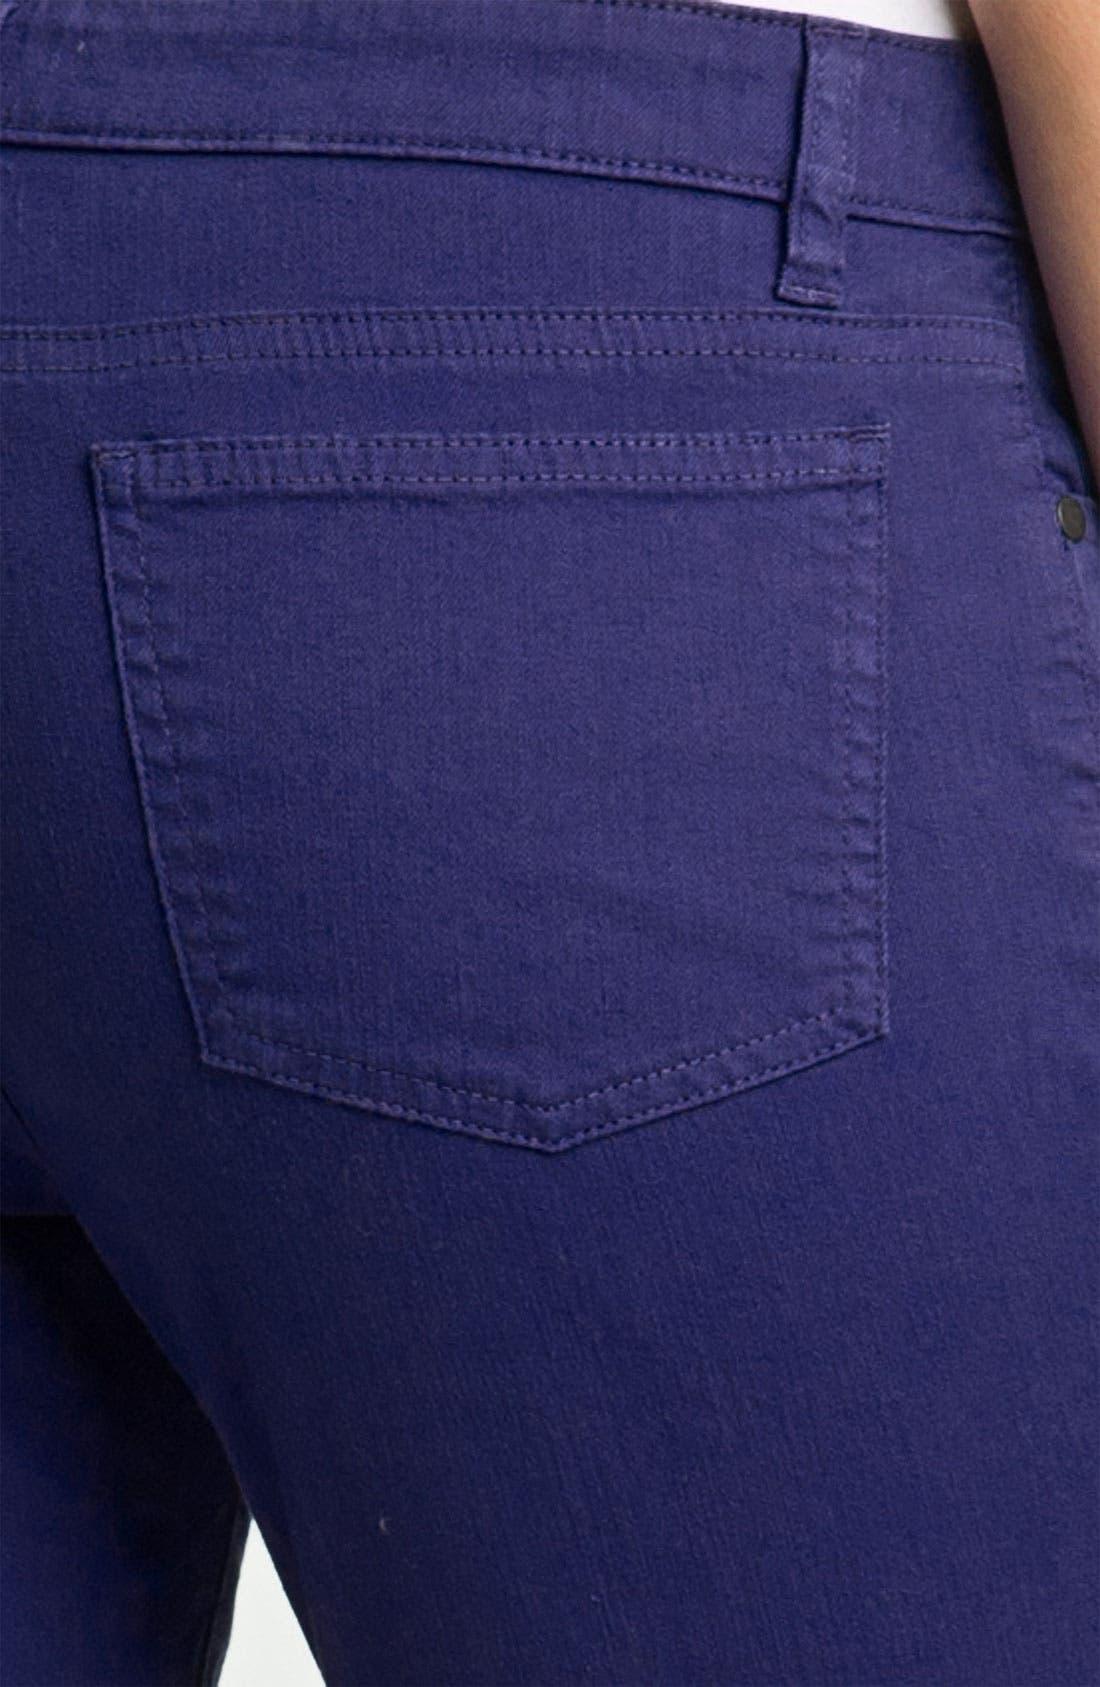 Skinny Ankle Jeans,                             Alternate thumbnail 24, color,